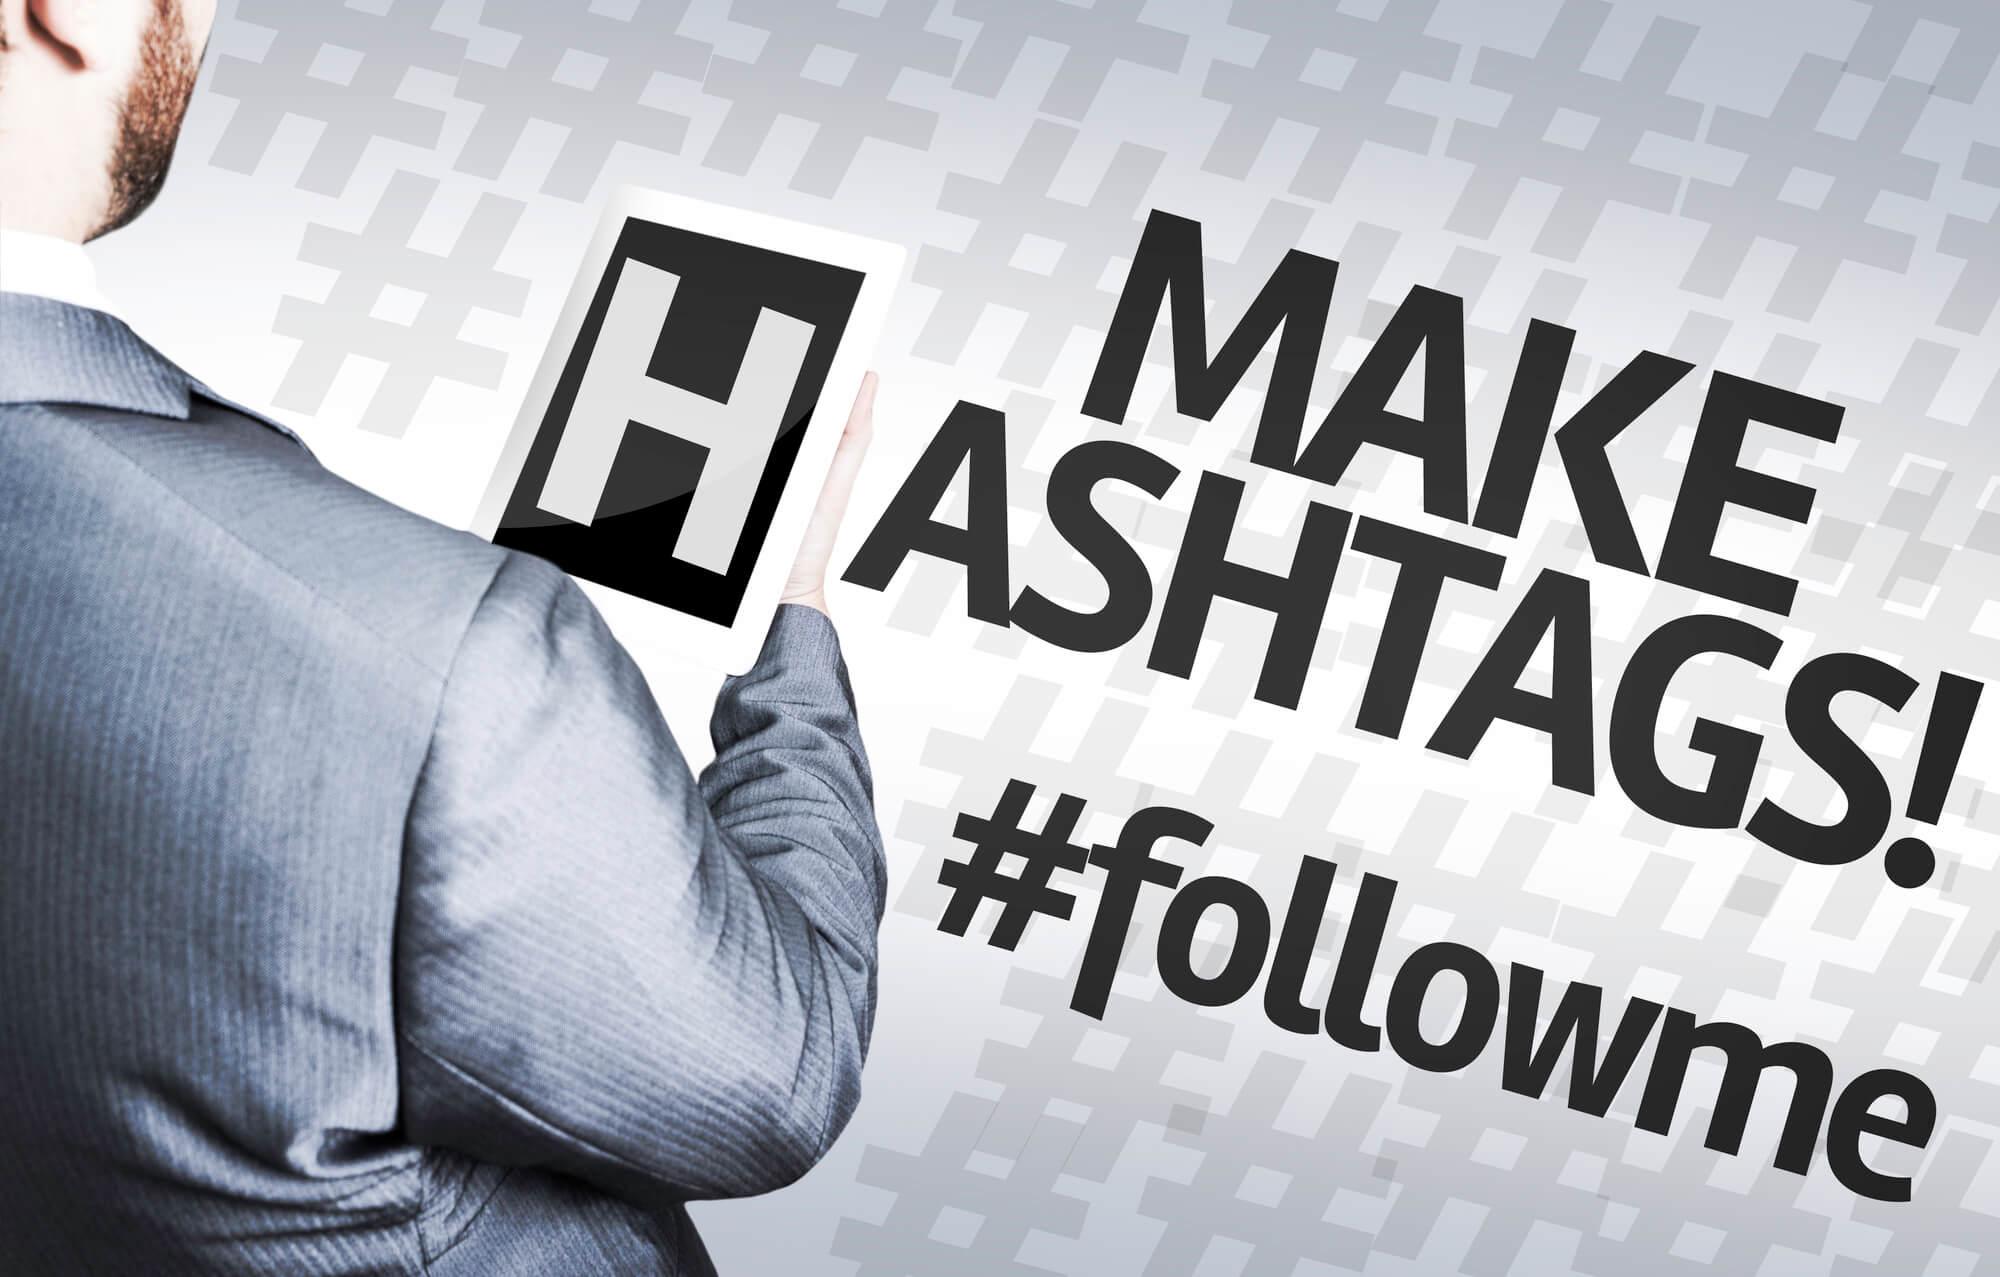 hashtags-social-media-engagement